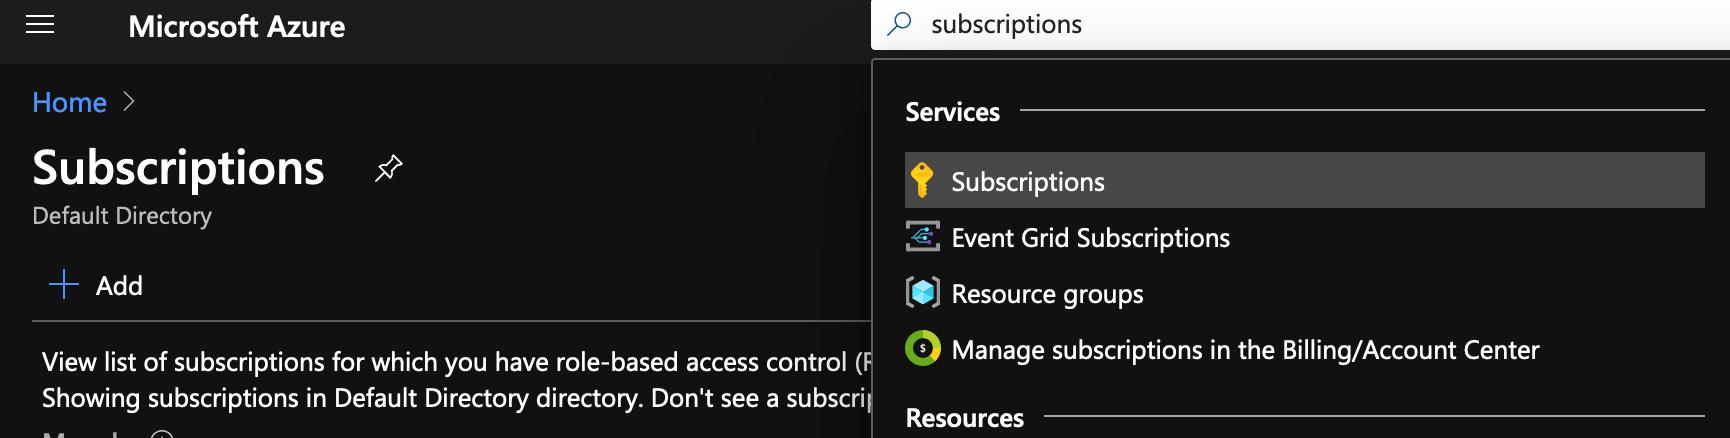 Azure Subscription